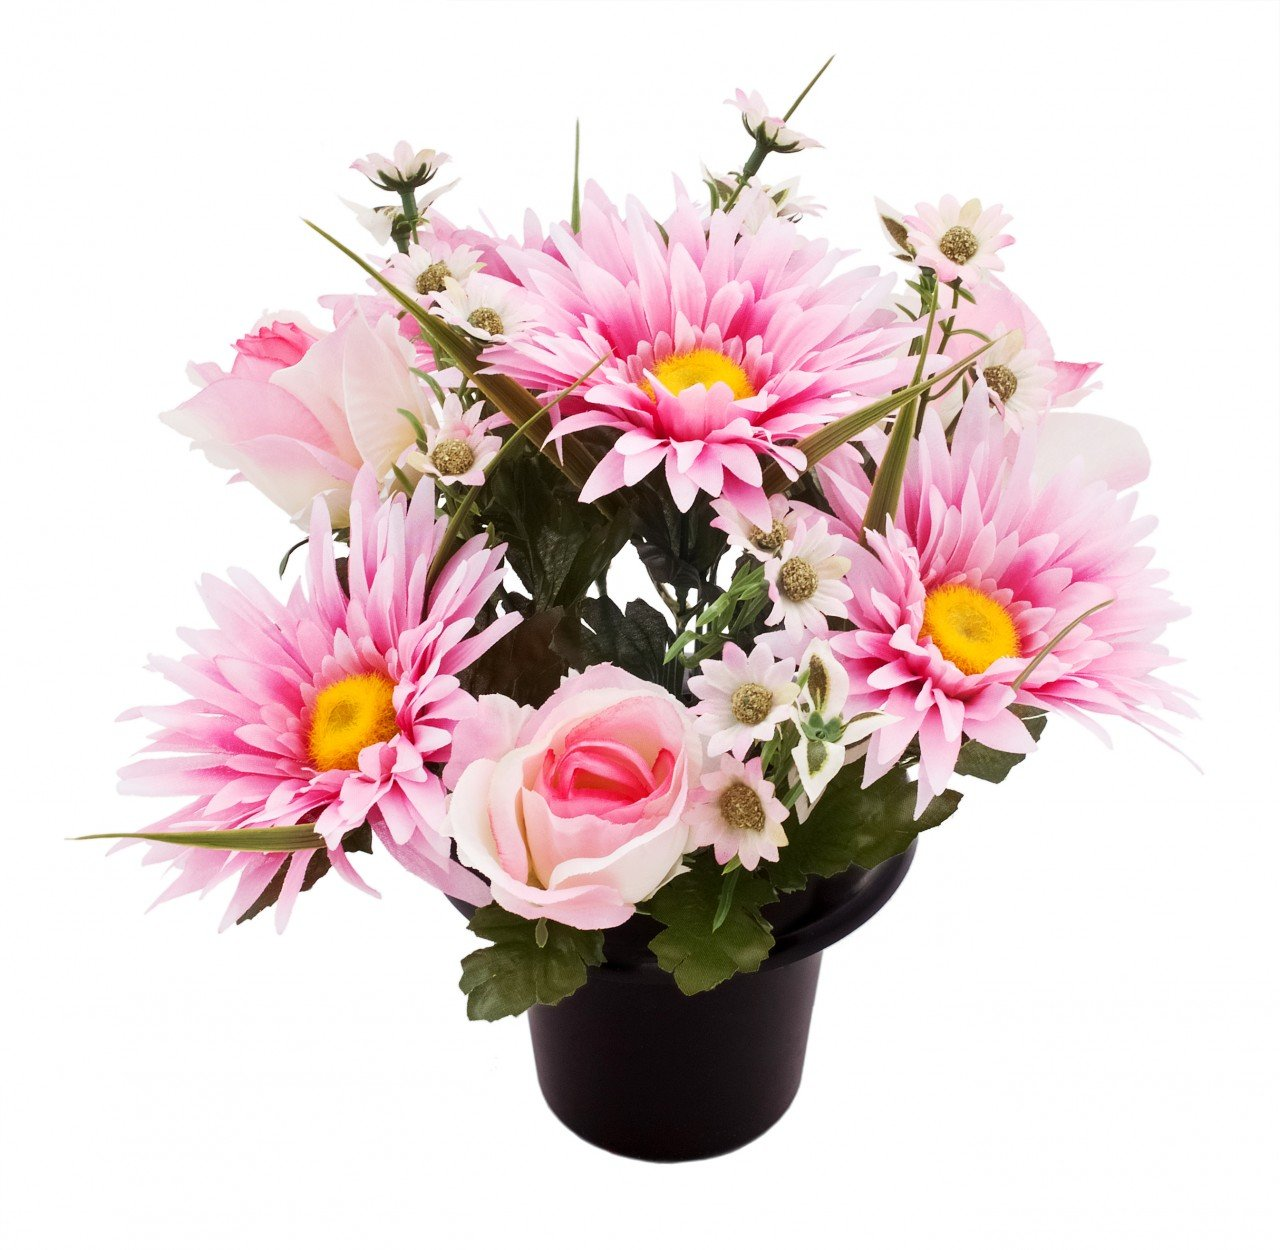 ARTIFICIAL PINK ROSE GERBERA AND DAISY GRAVE VASE INSERT POT MEMORIAL